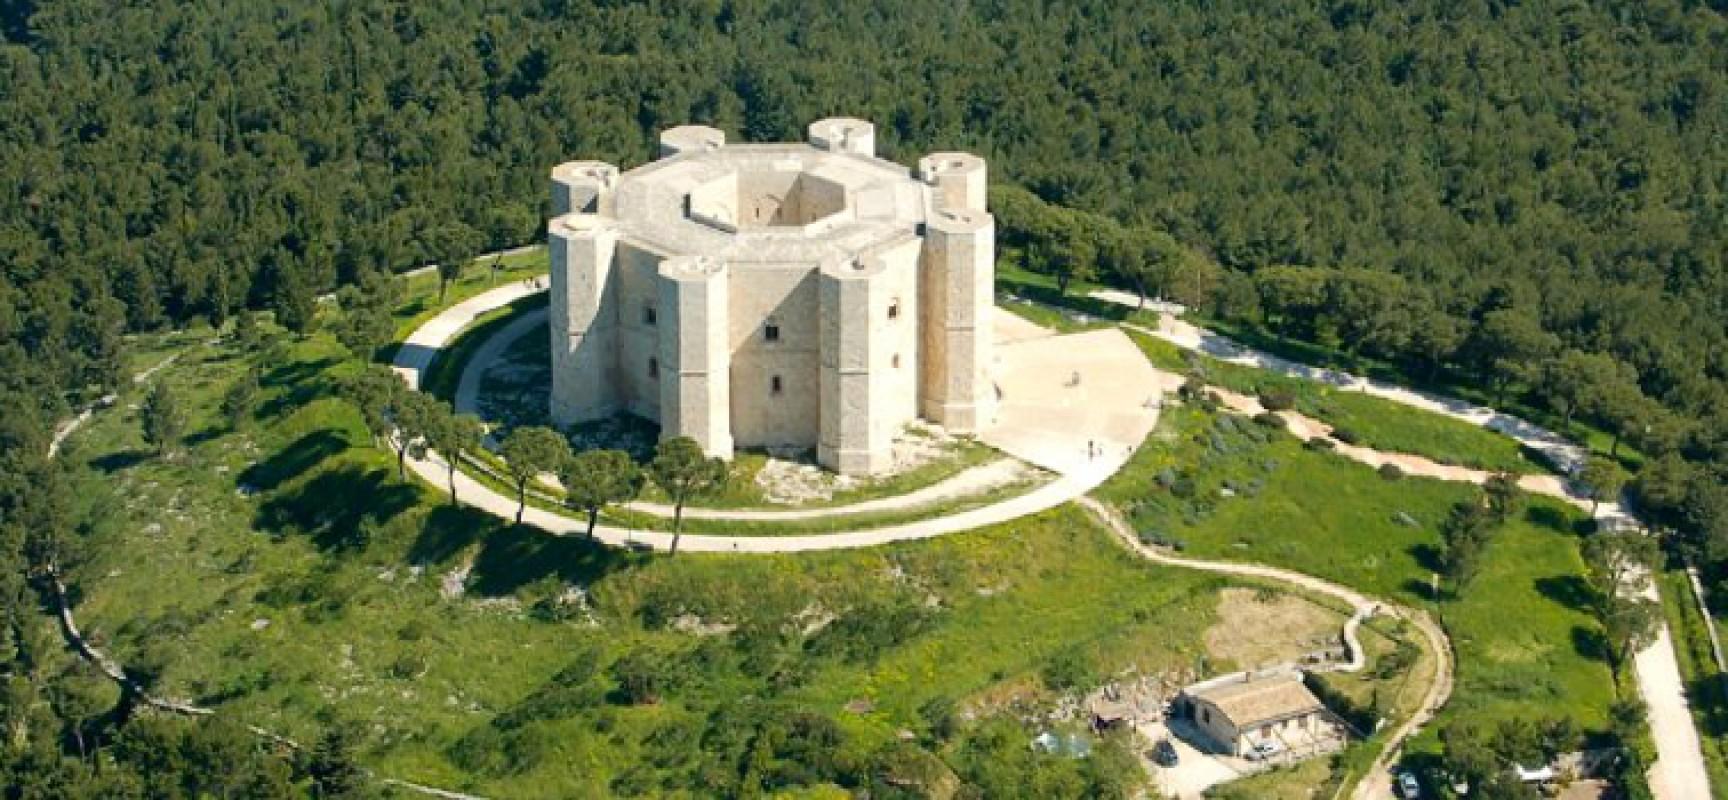 Concorso studentesco per realizzare uno short pubblicitario su Castel del Monte